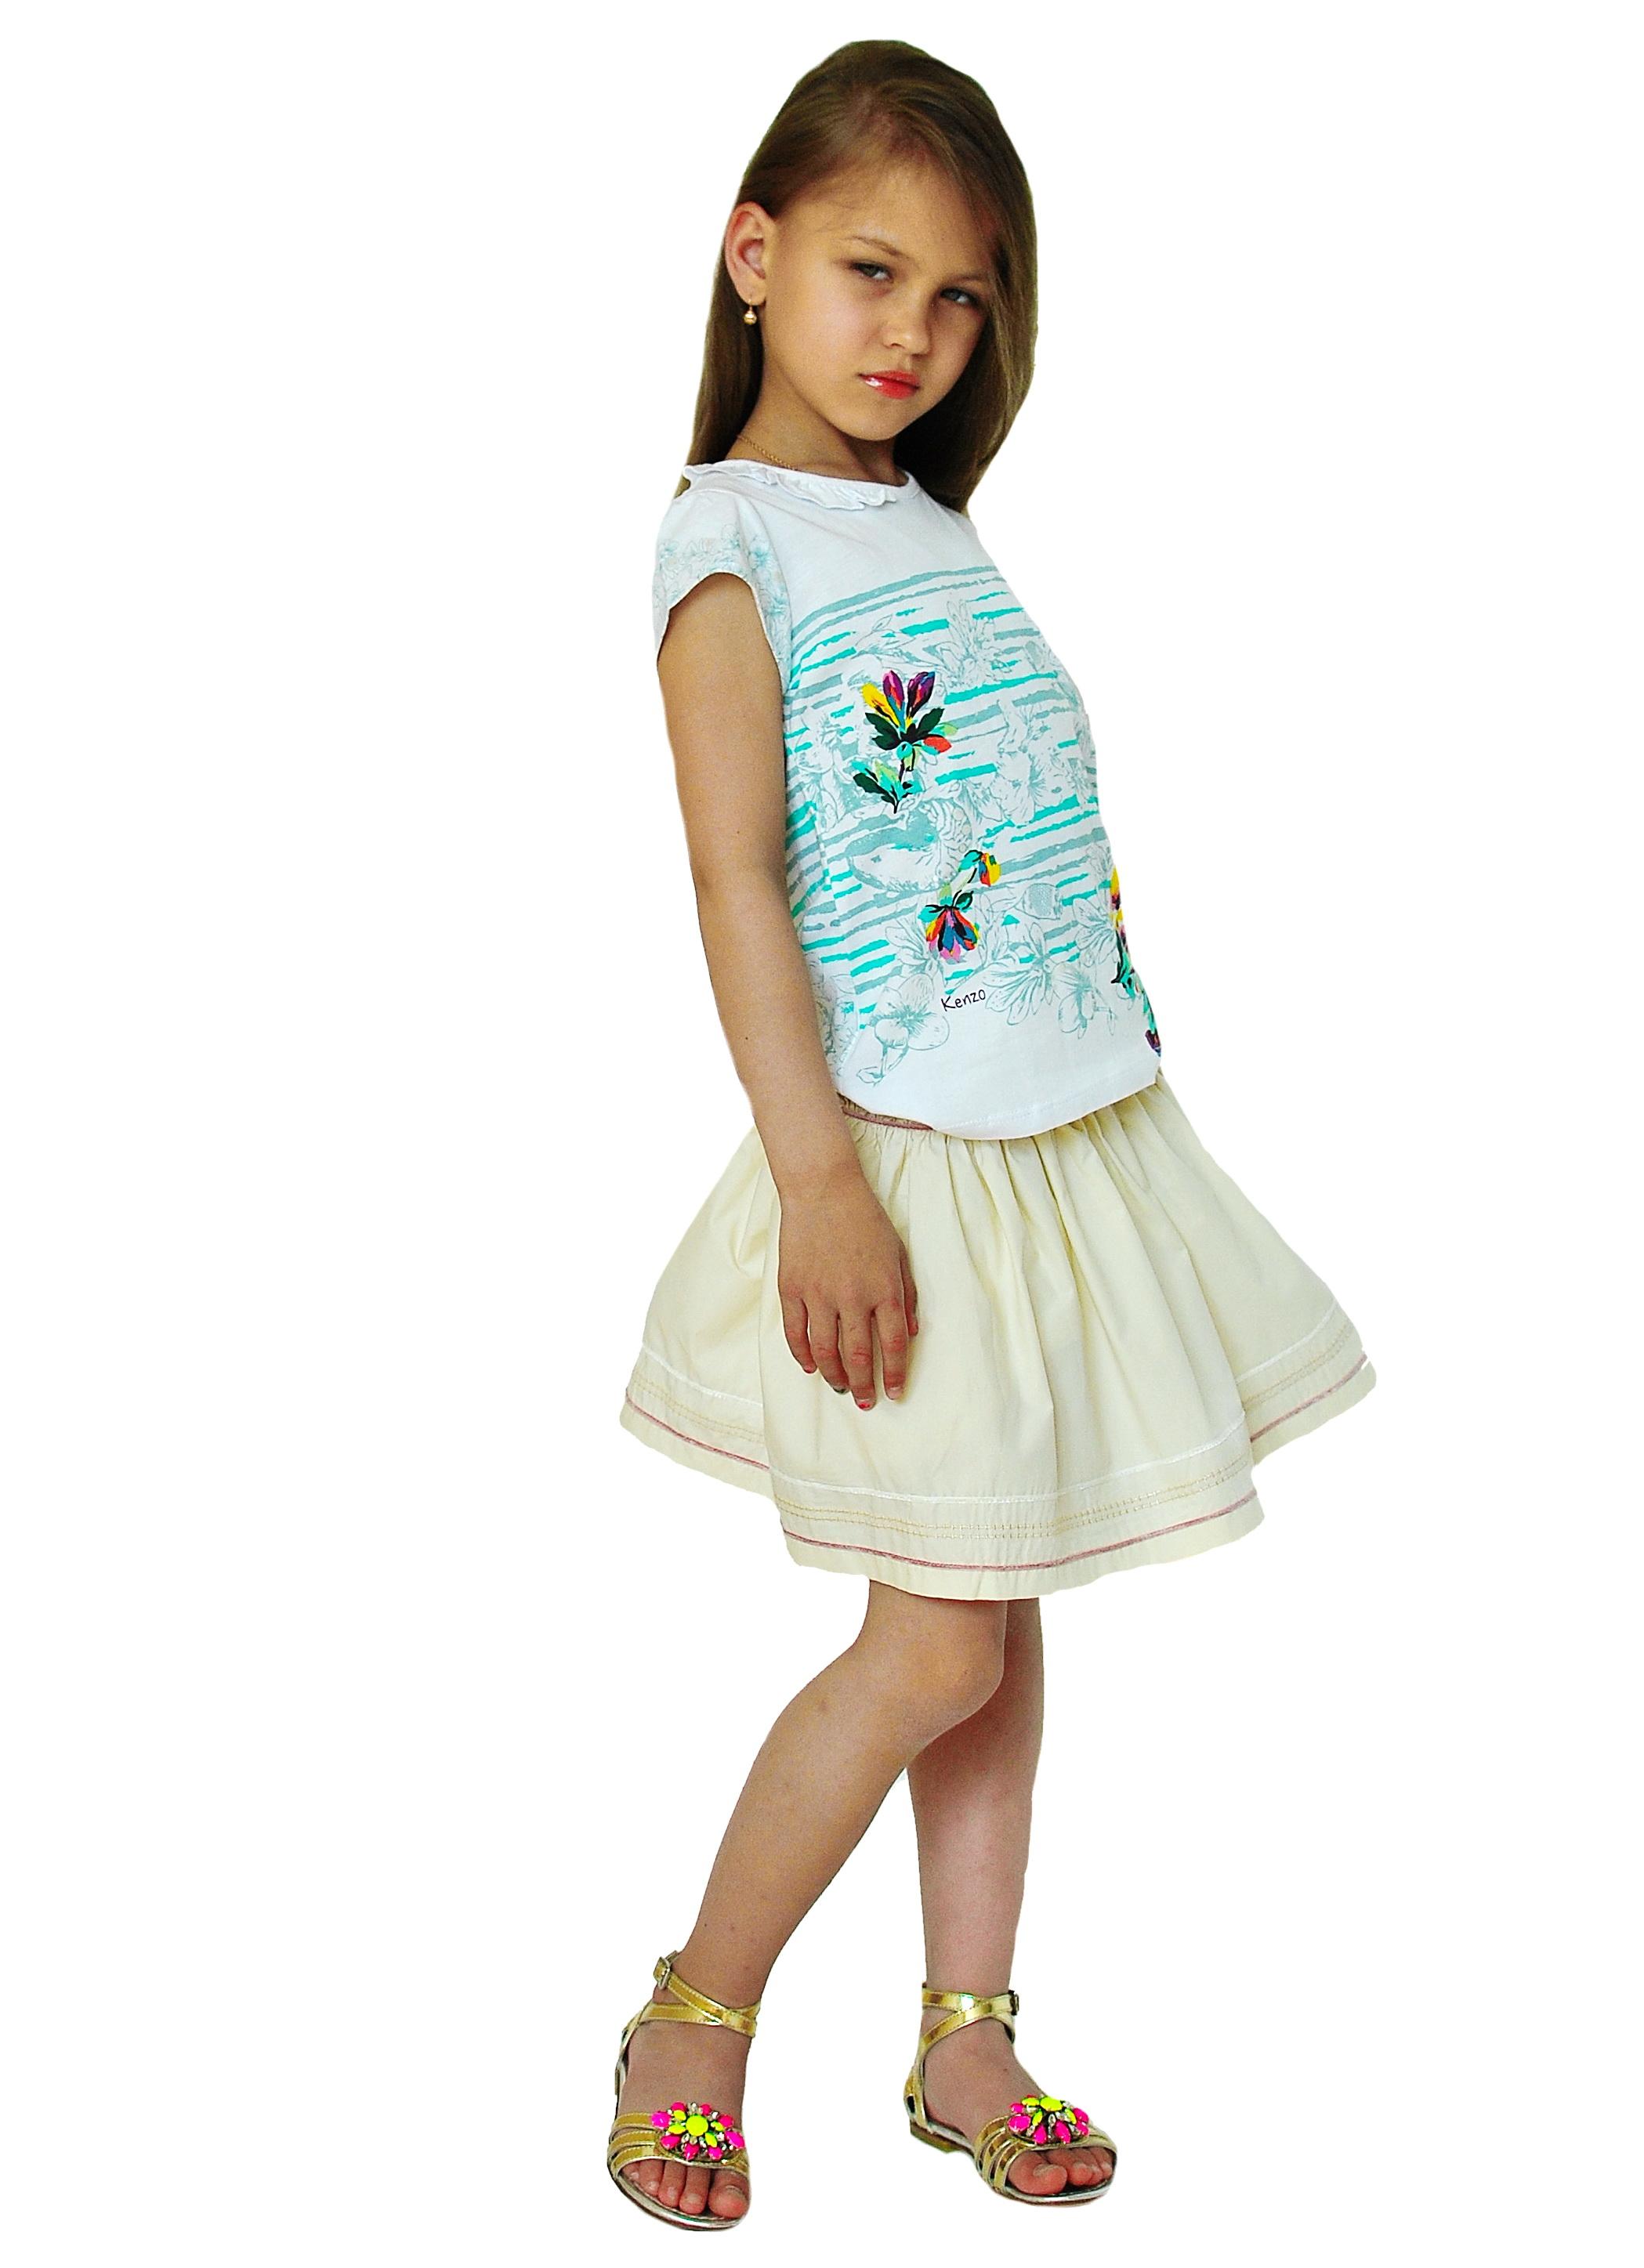 Фото 4: Яркая футболка Kenzo для девочек